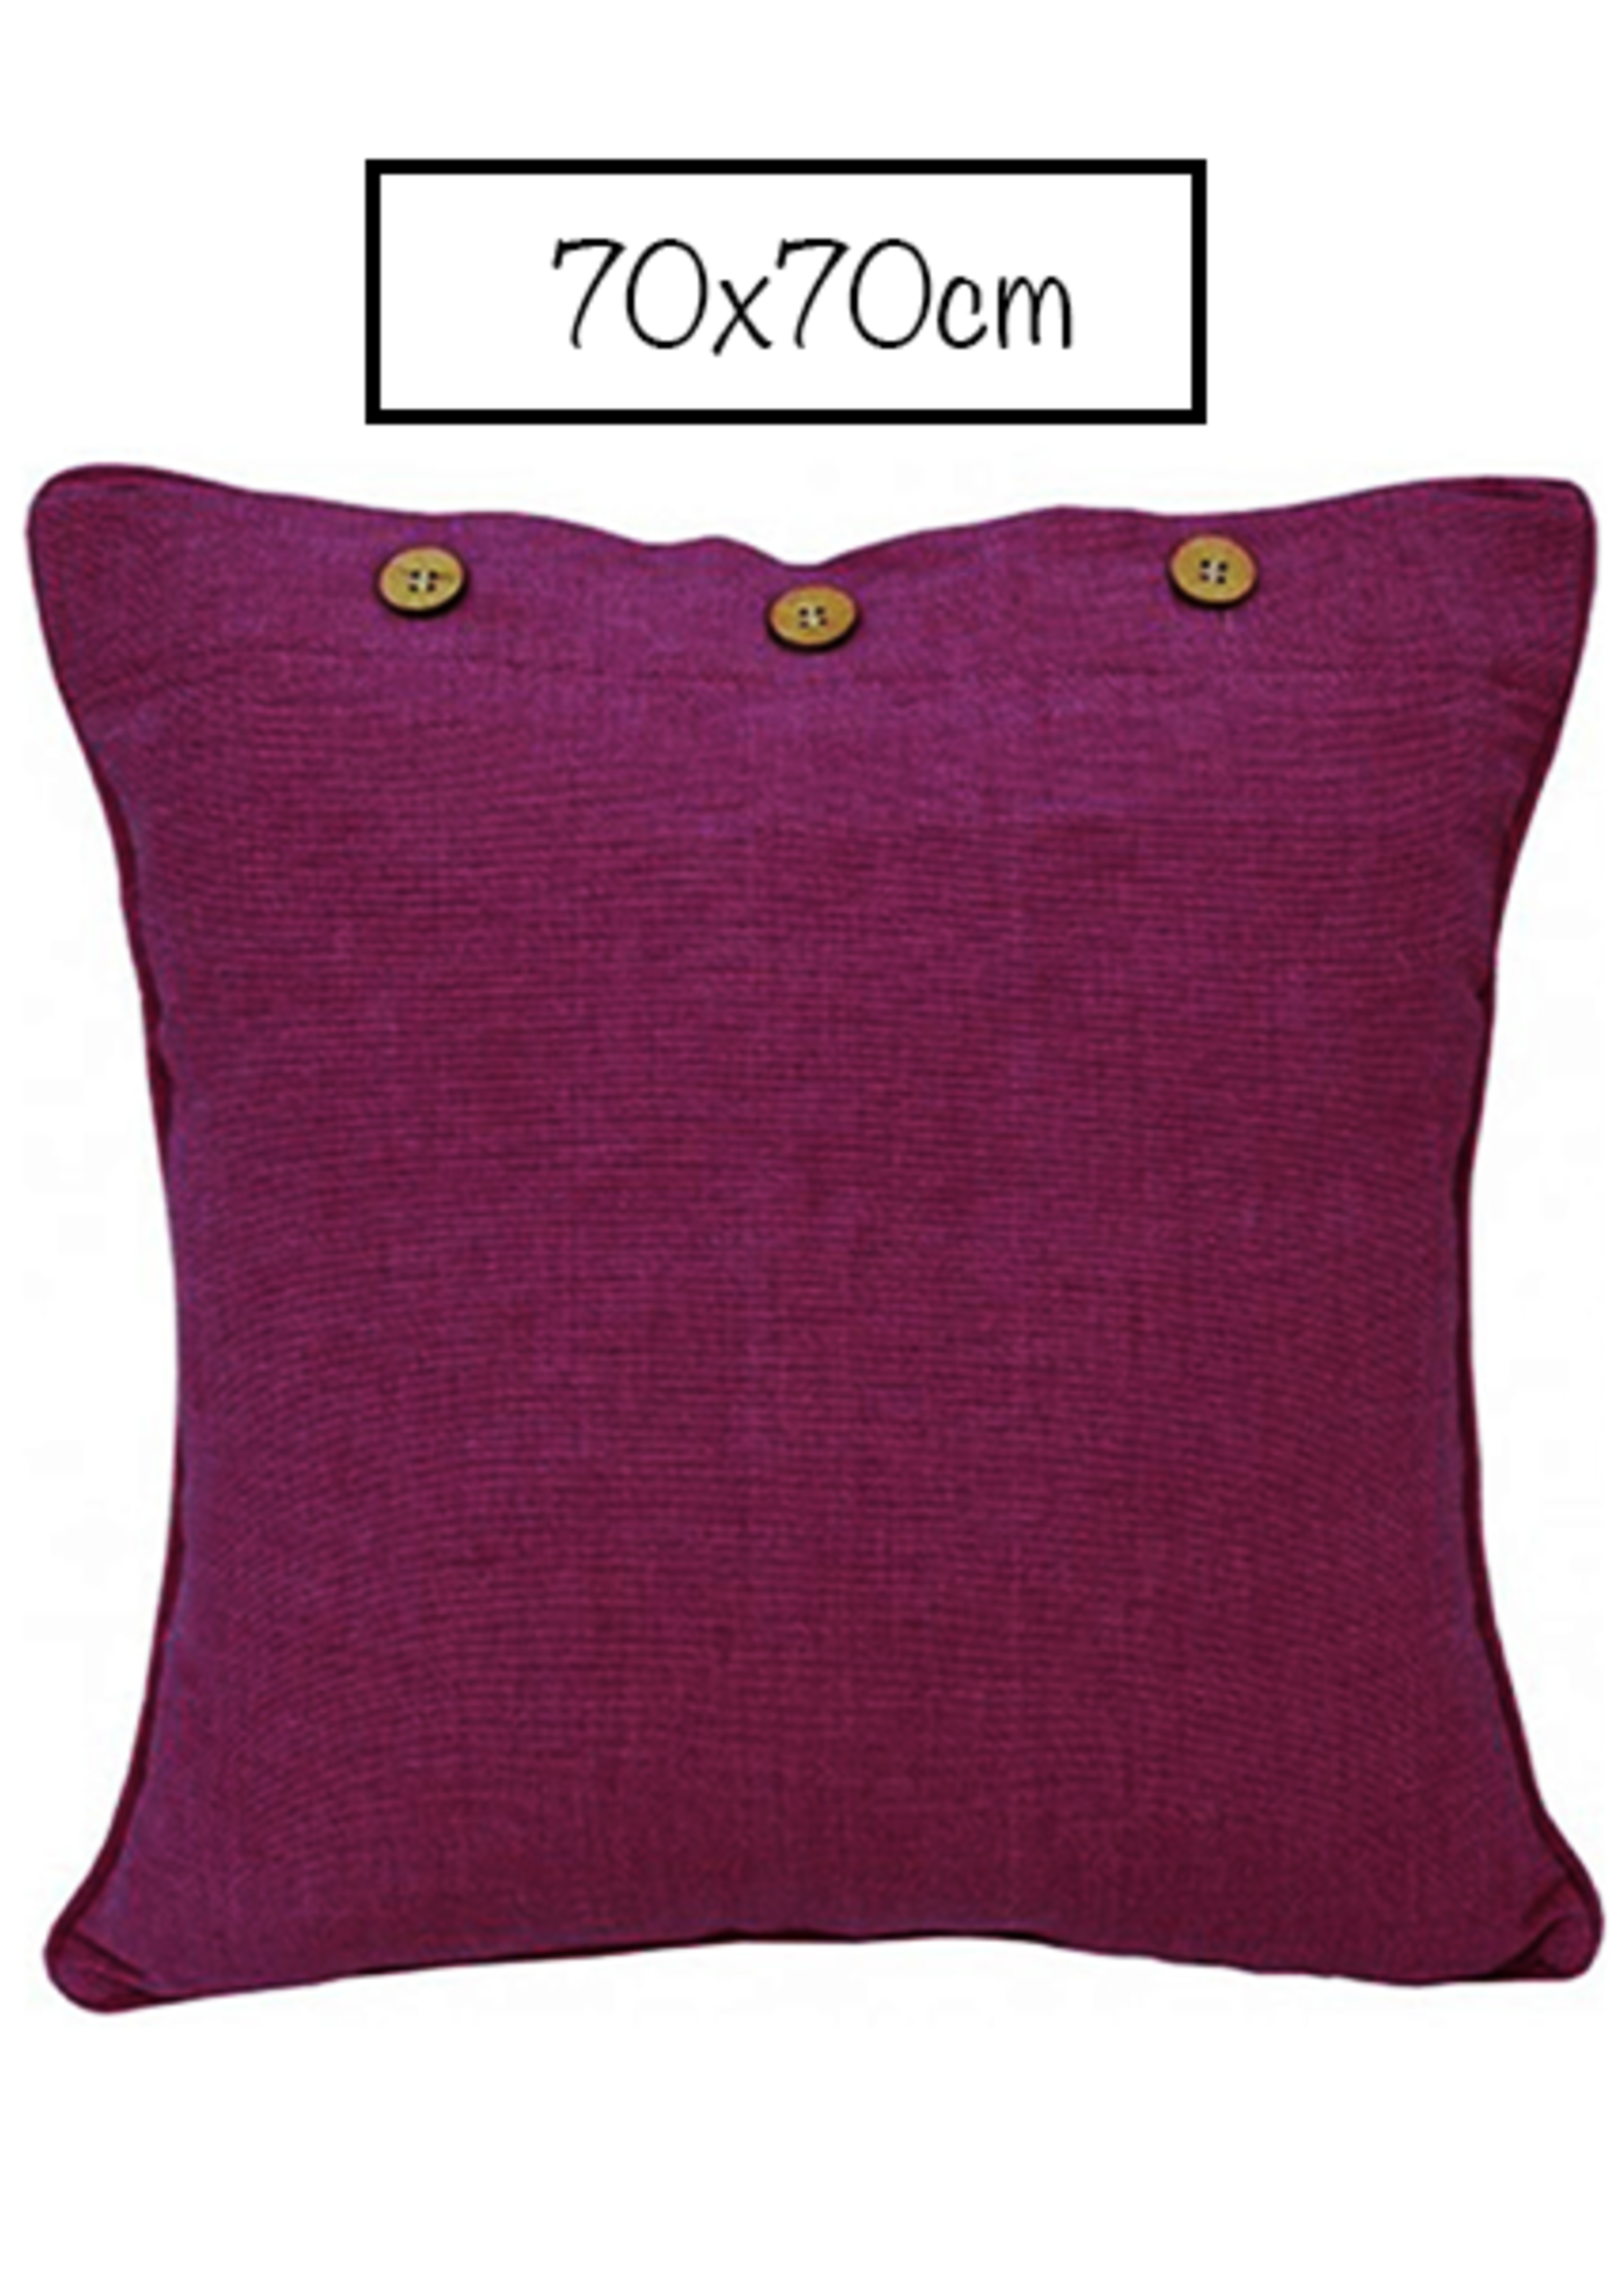 Craft Studio Pink Purple Cushion Cover 70x70cm